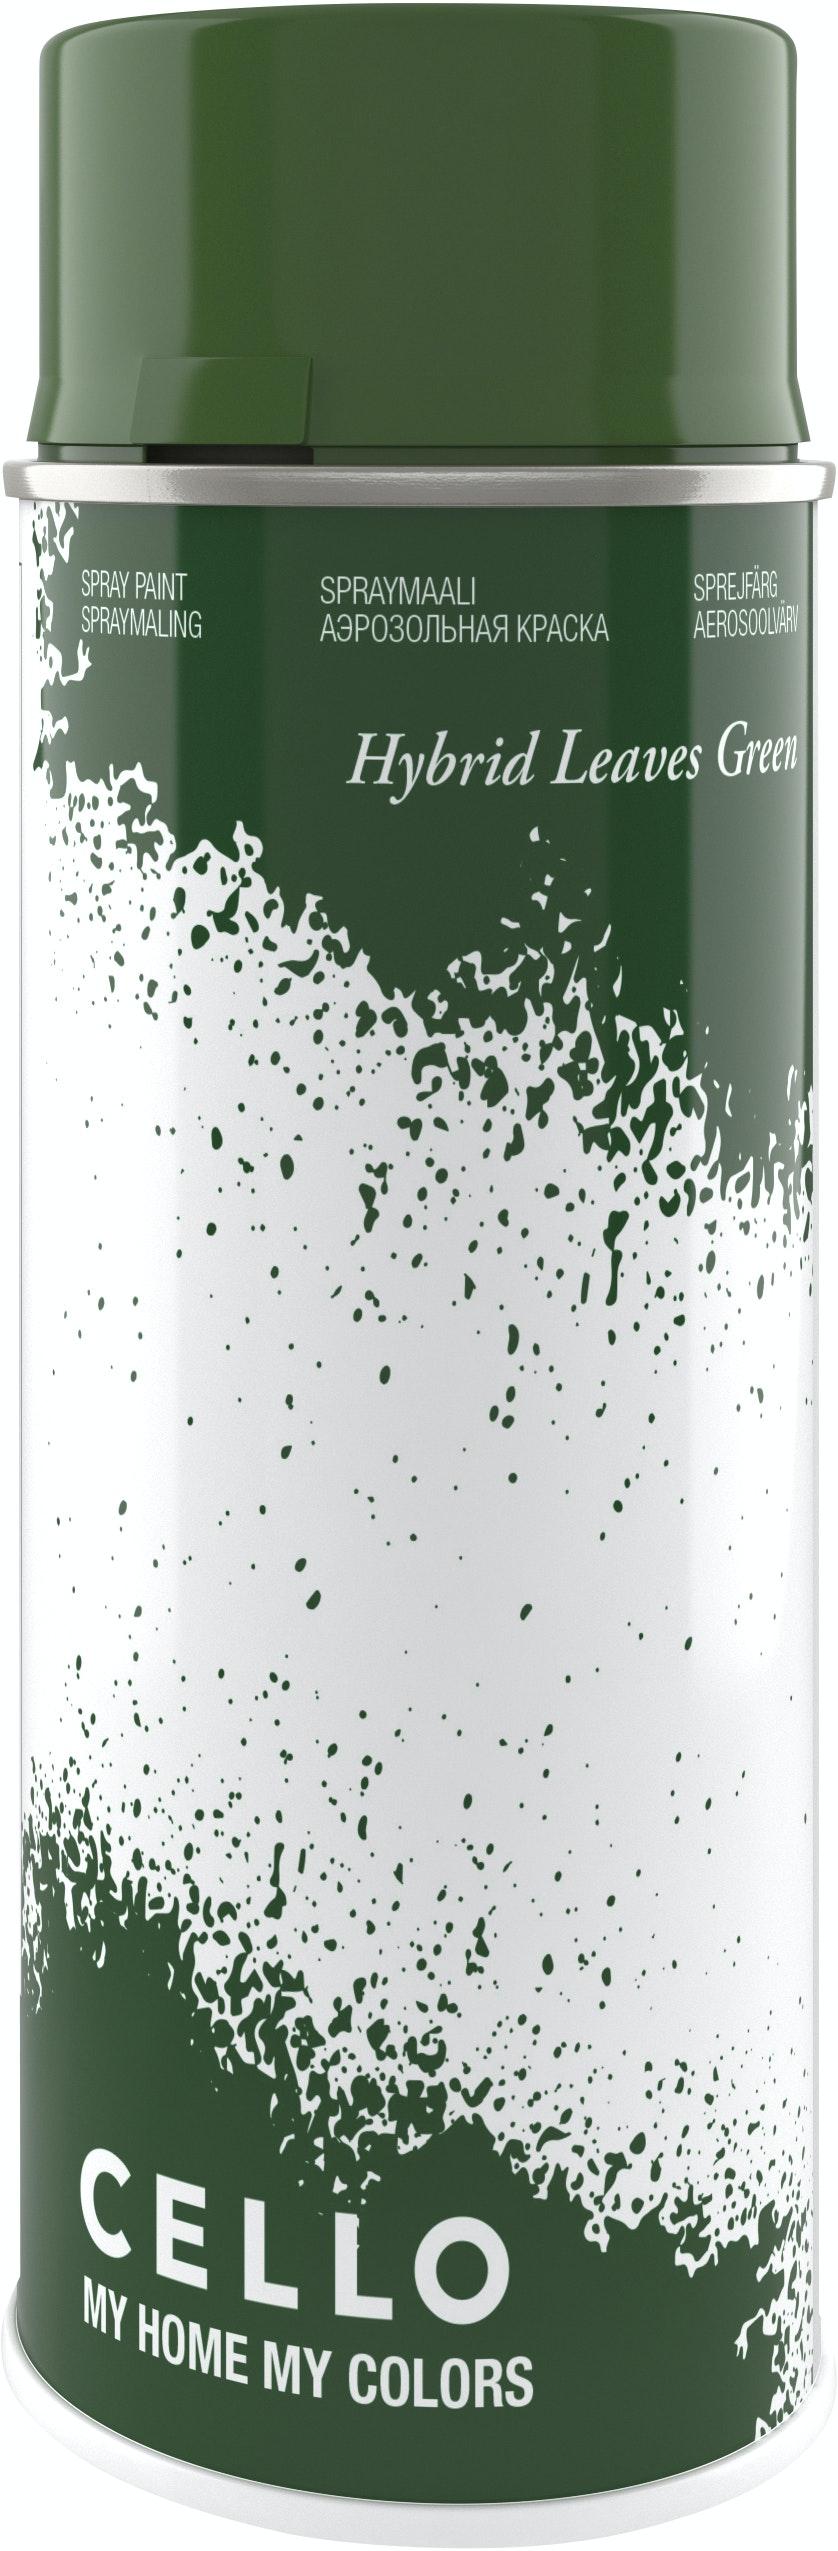 Sprayfärg Cello Hybrid Grön 400ml